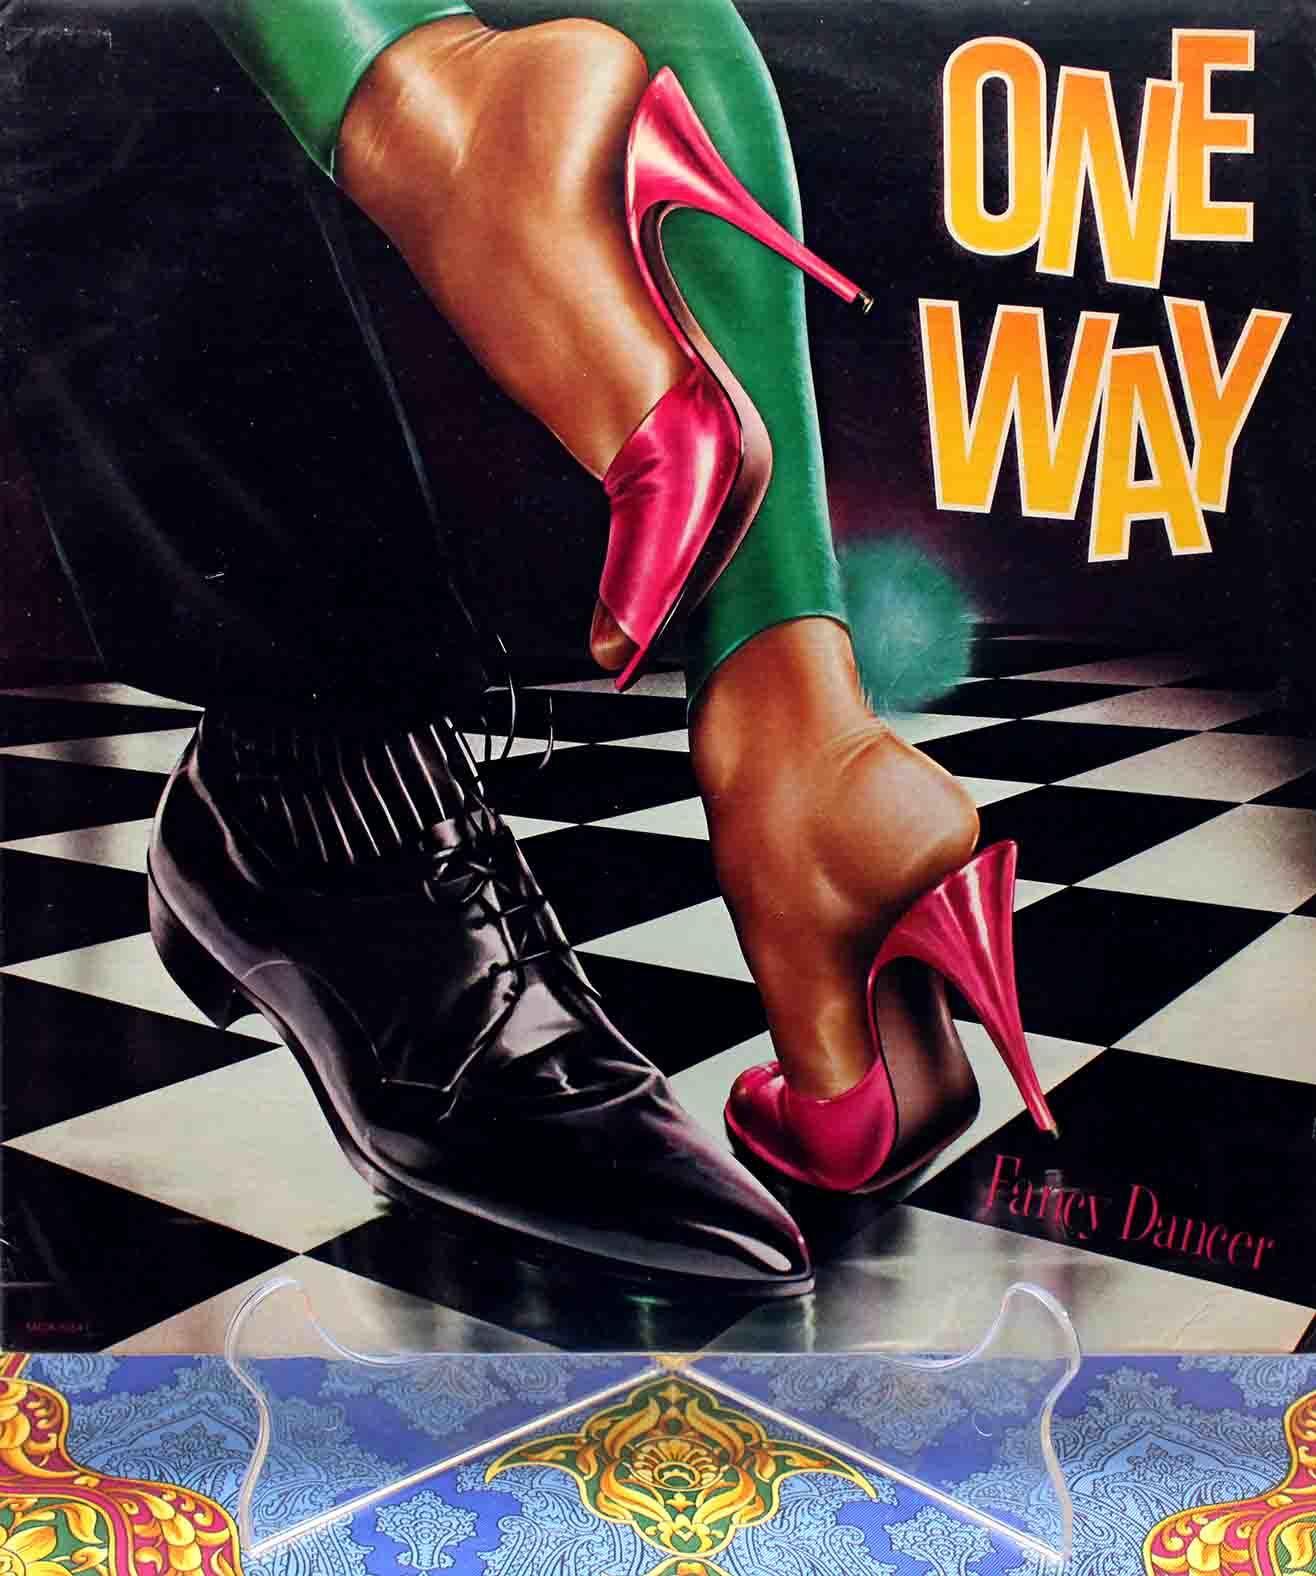 One Way - Fancy Dancer 01